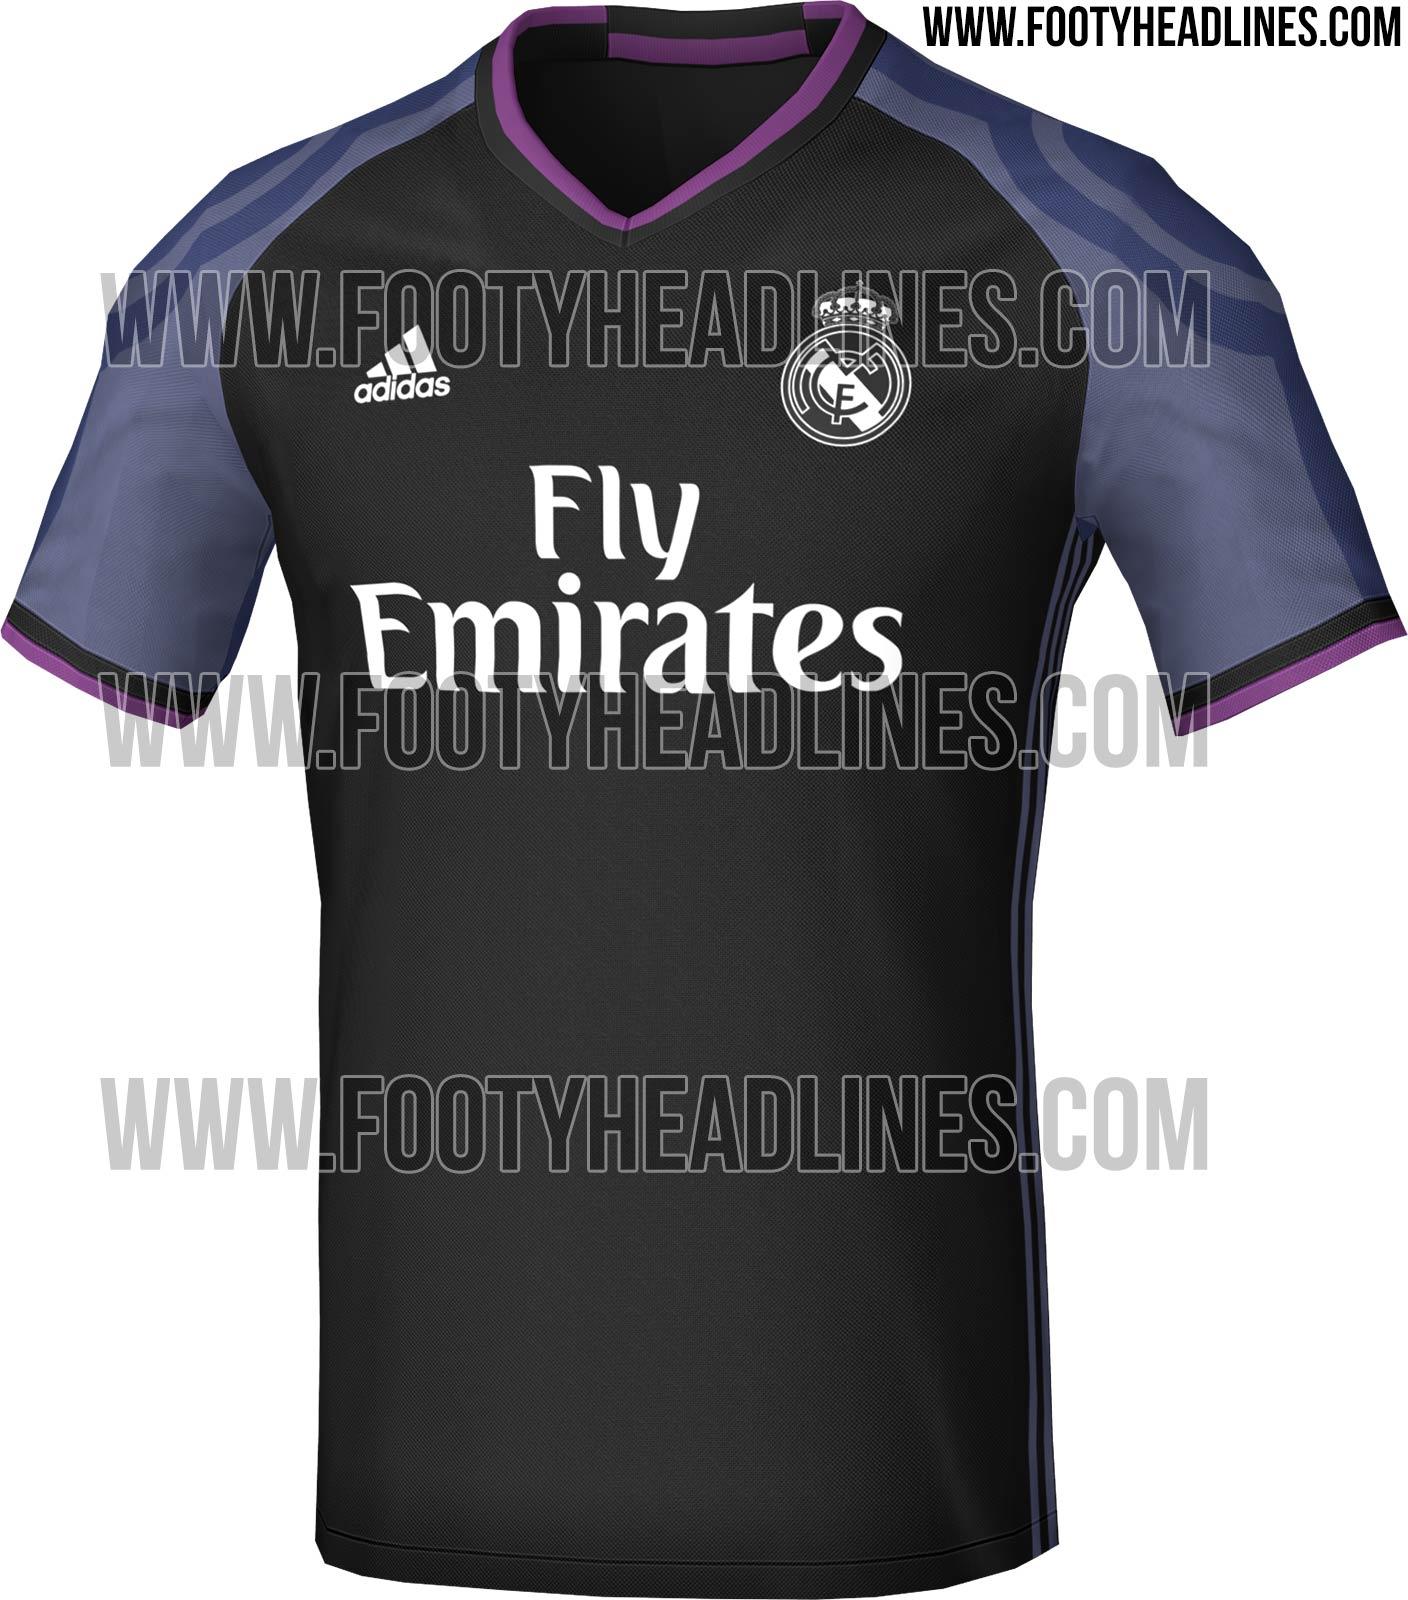 Site vaza suposta camisa do Real Madrid para próxima temporada - UOL ... 9d292659bee